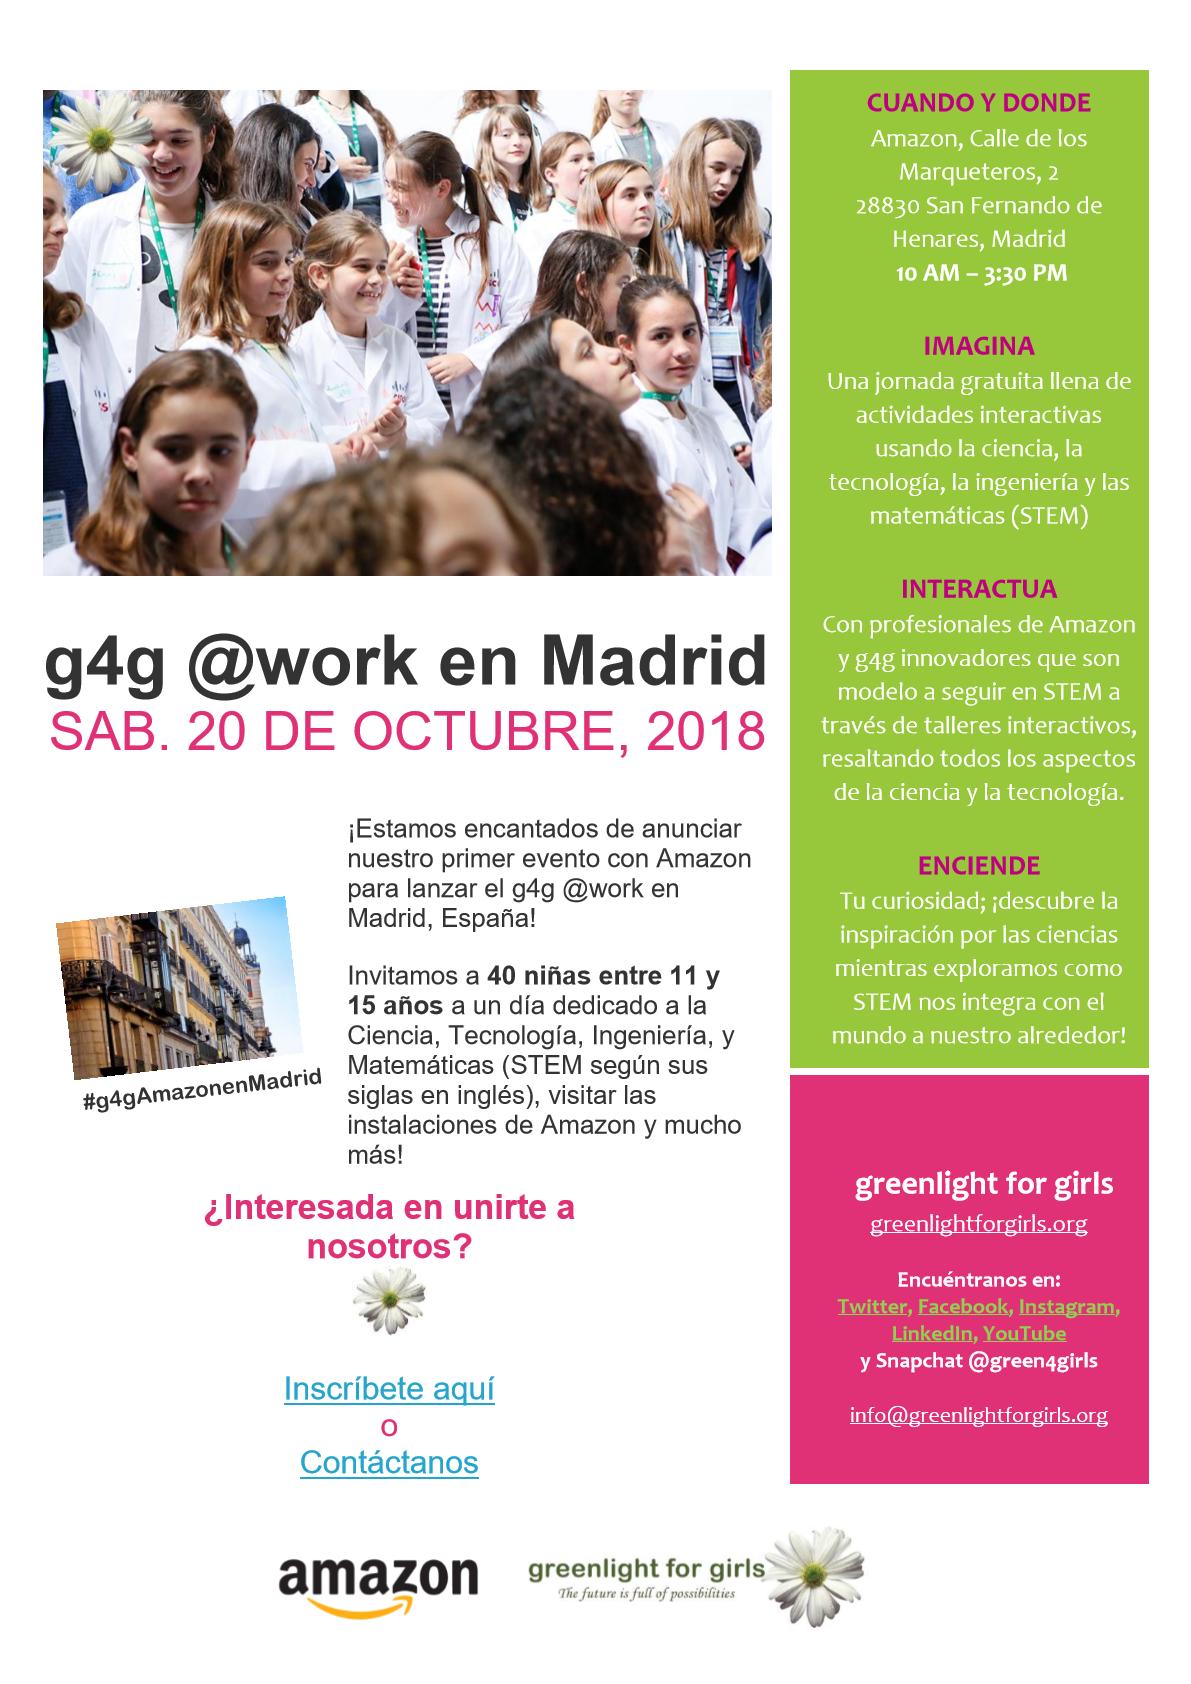 g4gatwork_Madrid2018_ES.jpg